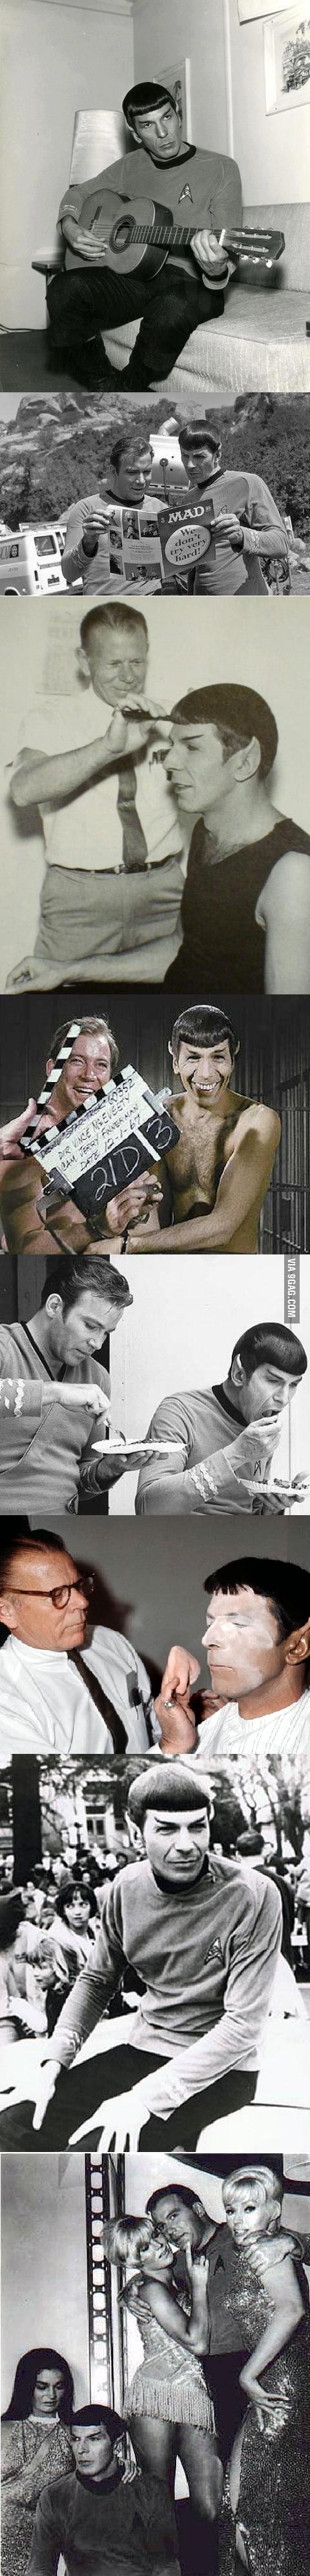 Star Trek Cool Photos